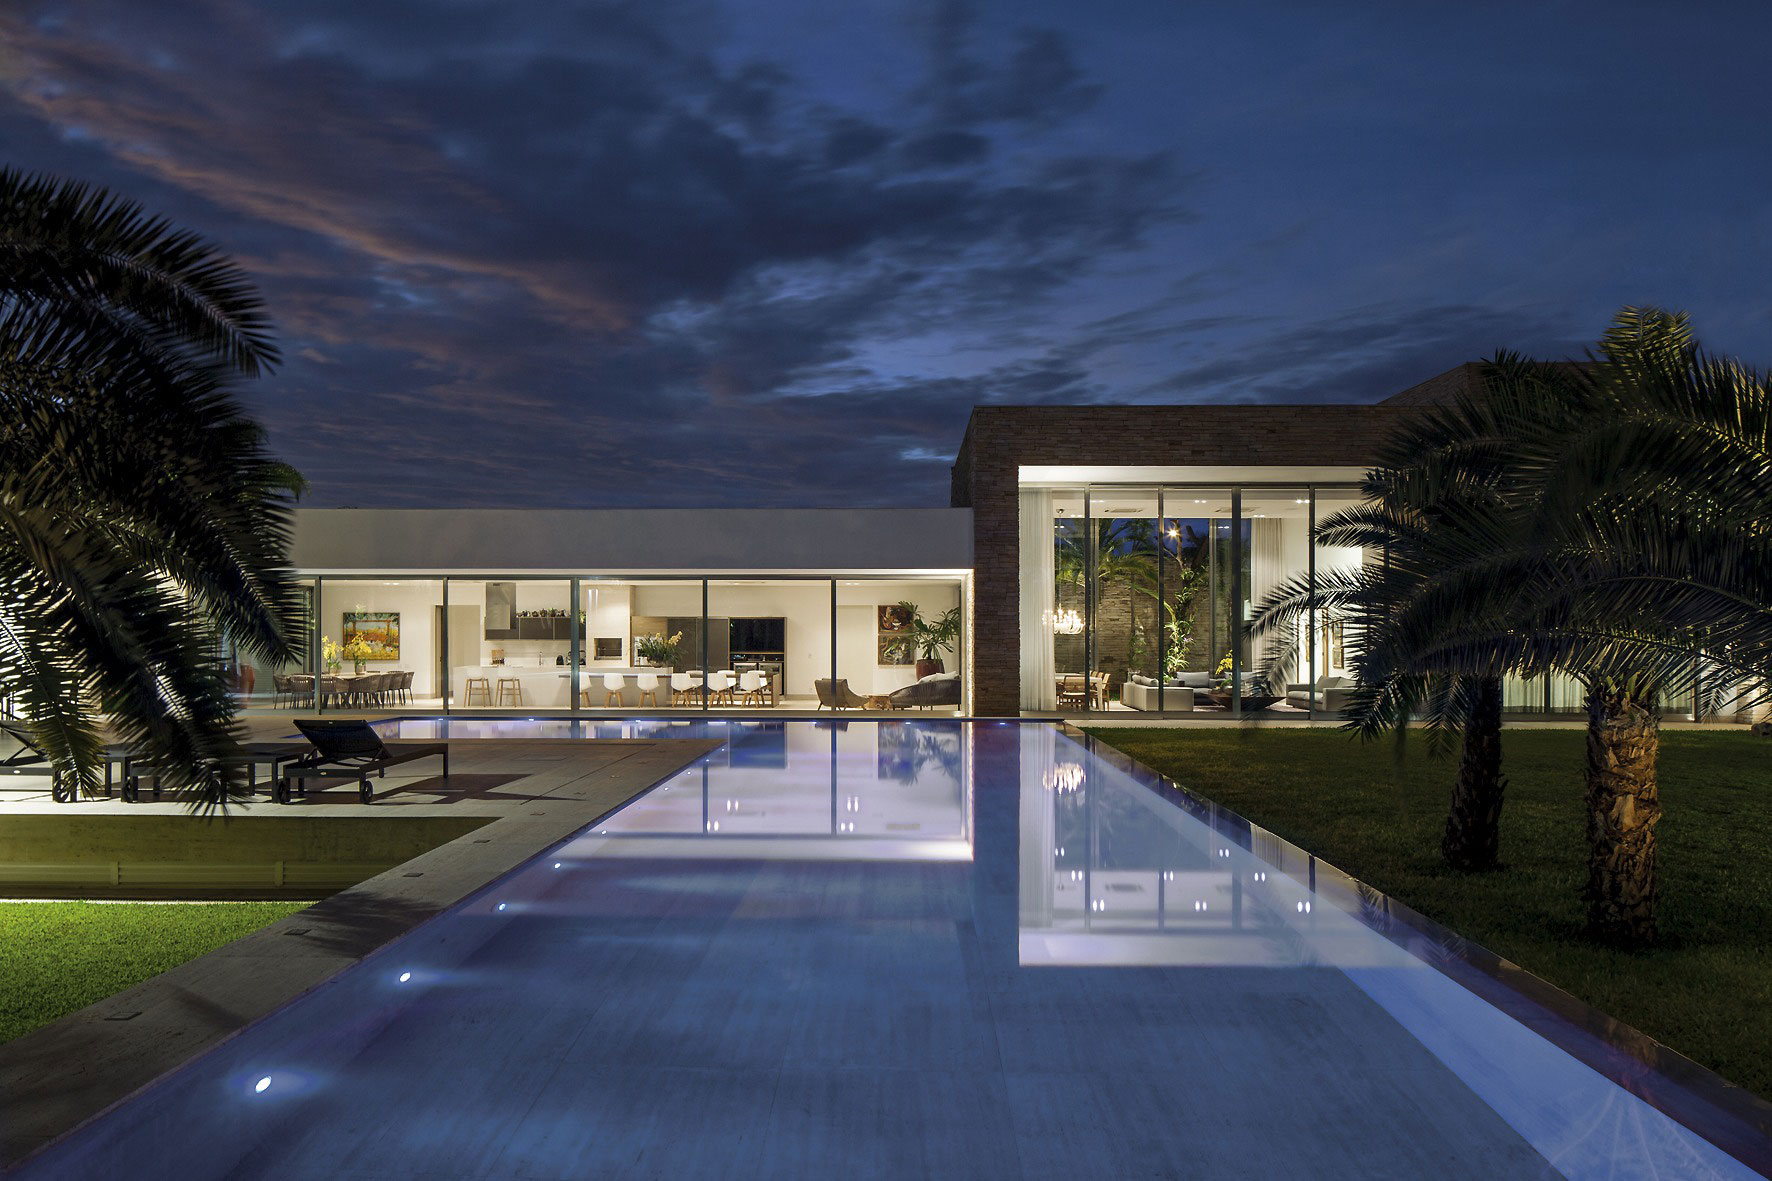 Exquisite Contemporary Home in Uberlândia, Brazil